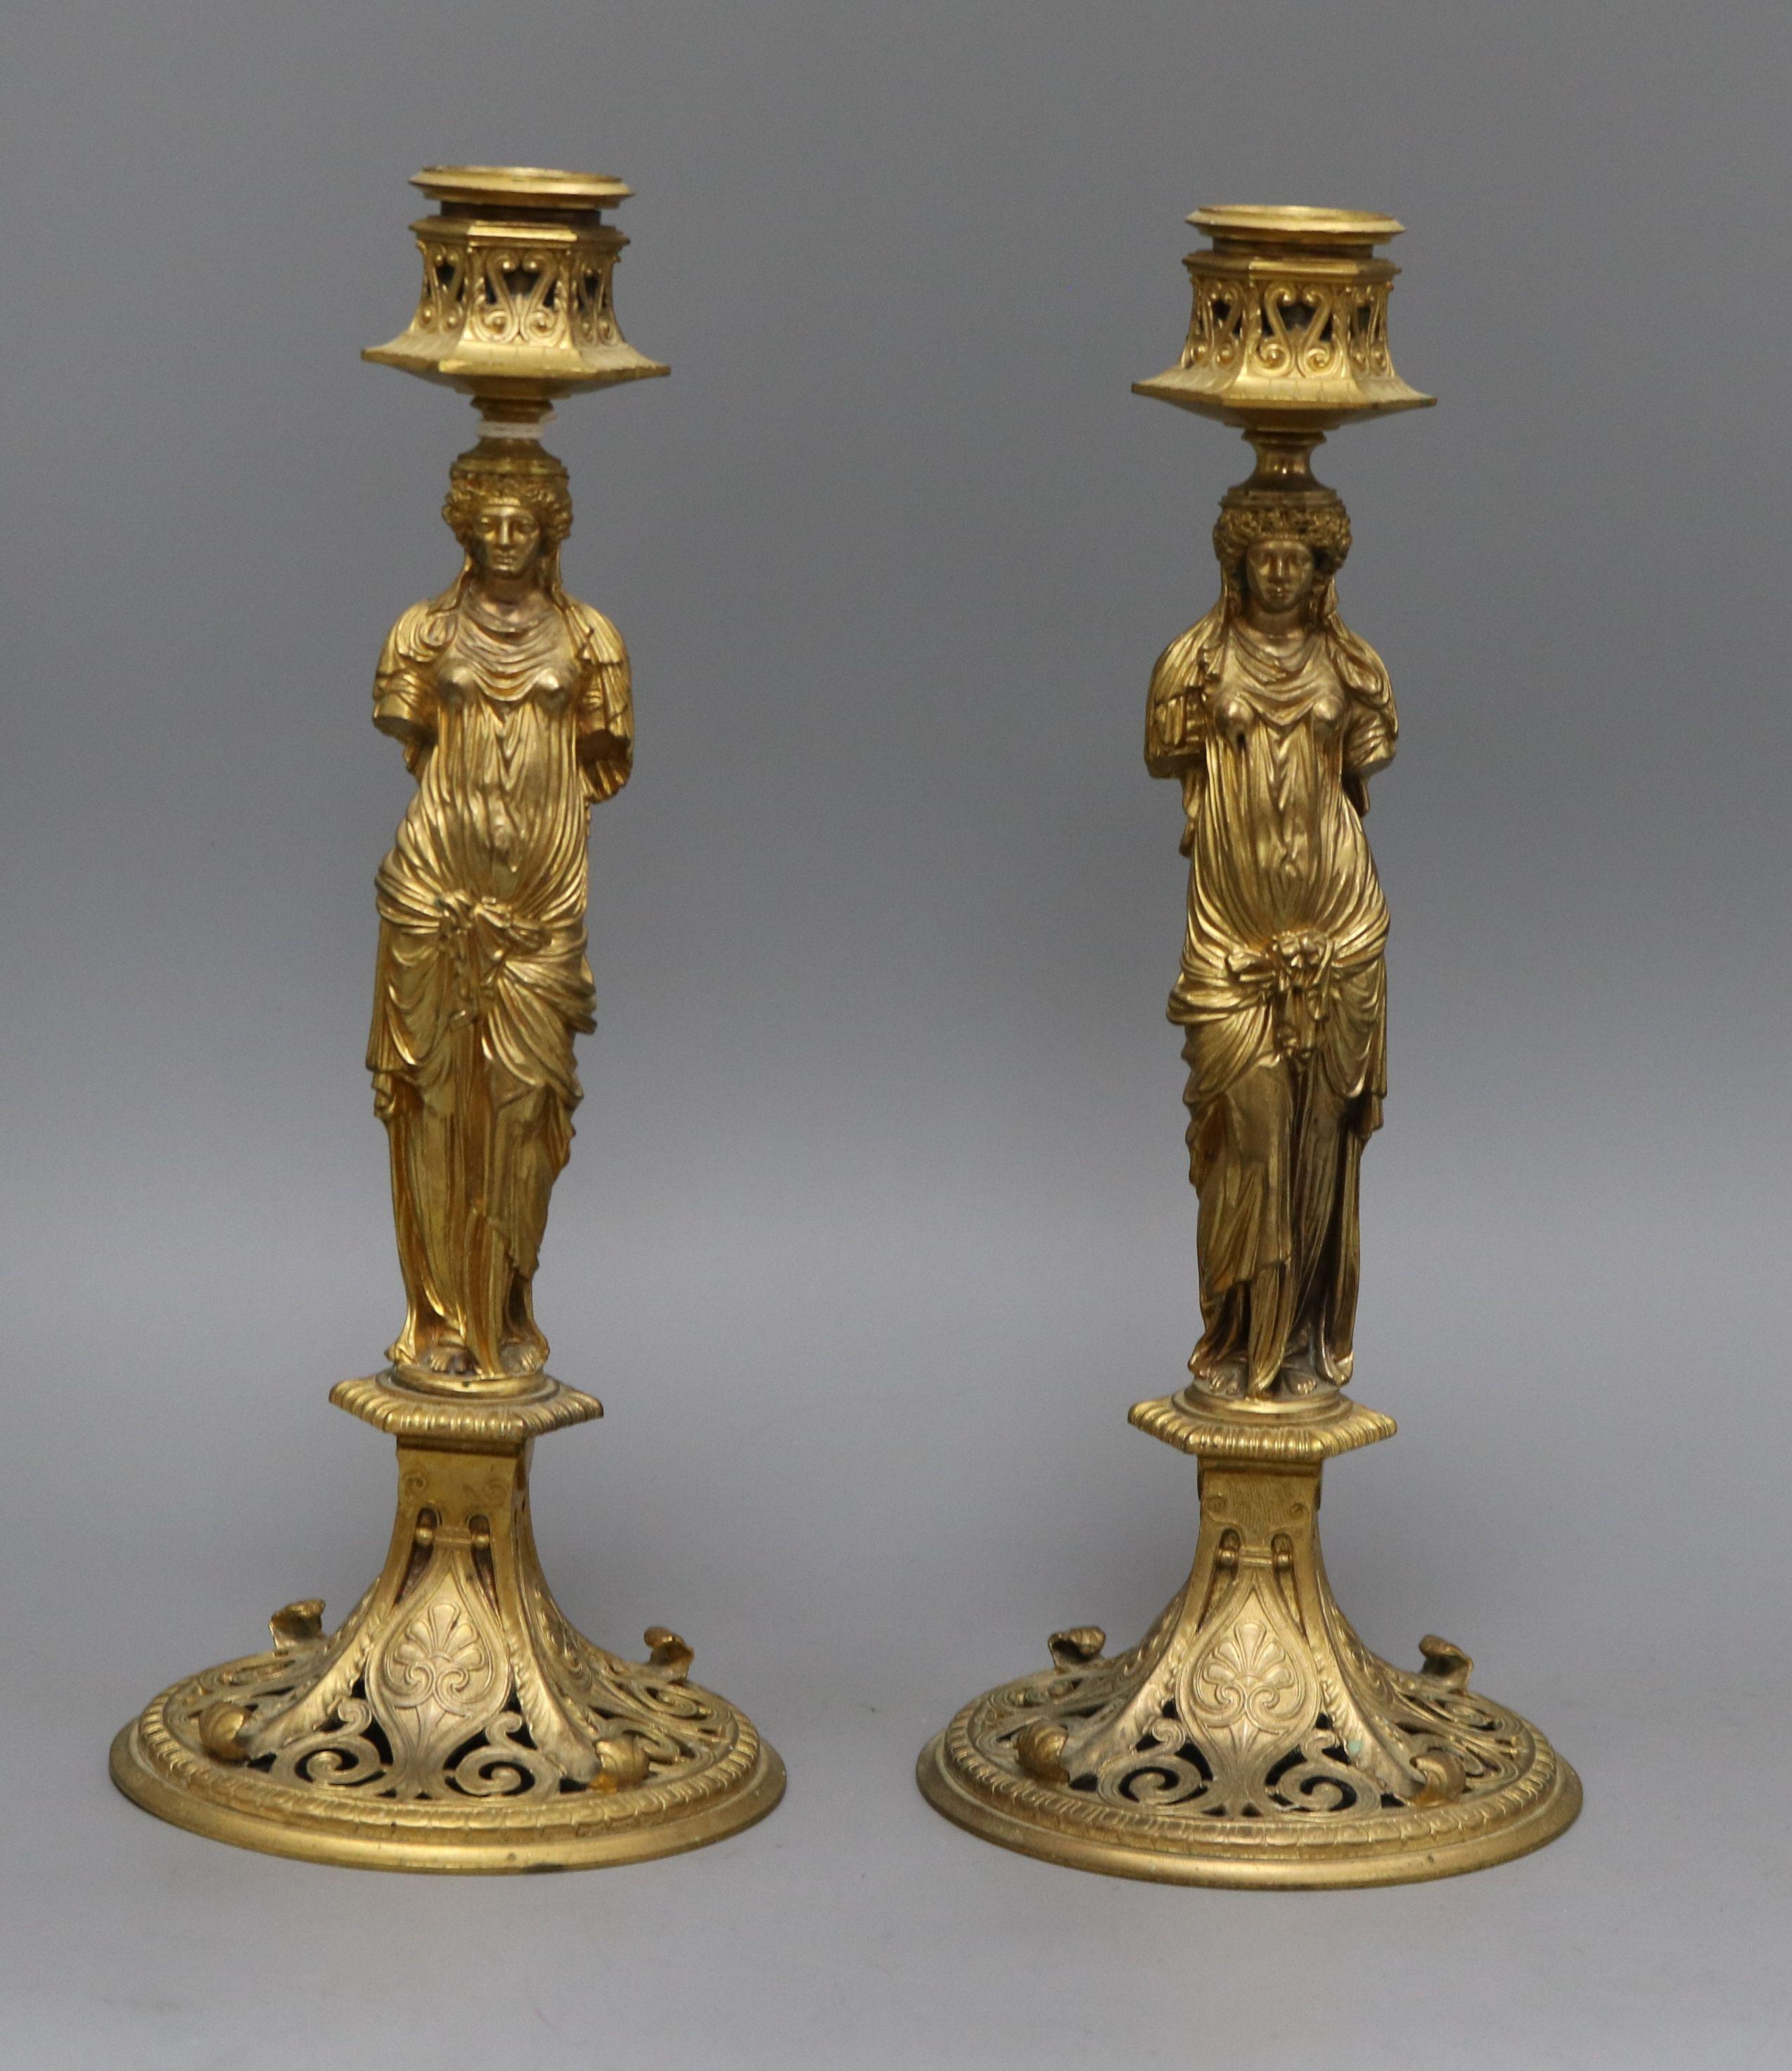 Lot 29 - A pair of Grecian revival ormolu candlesticks height 27cm